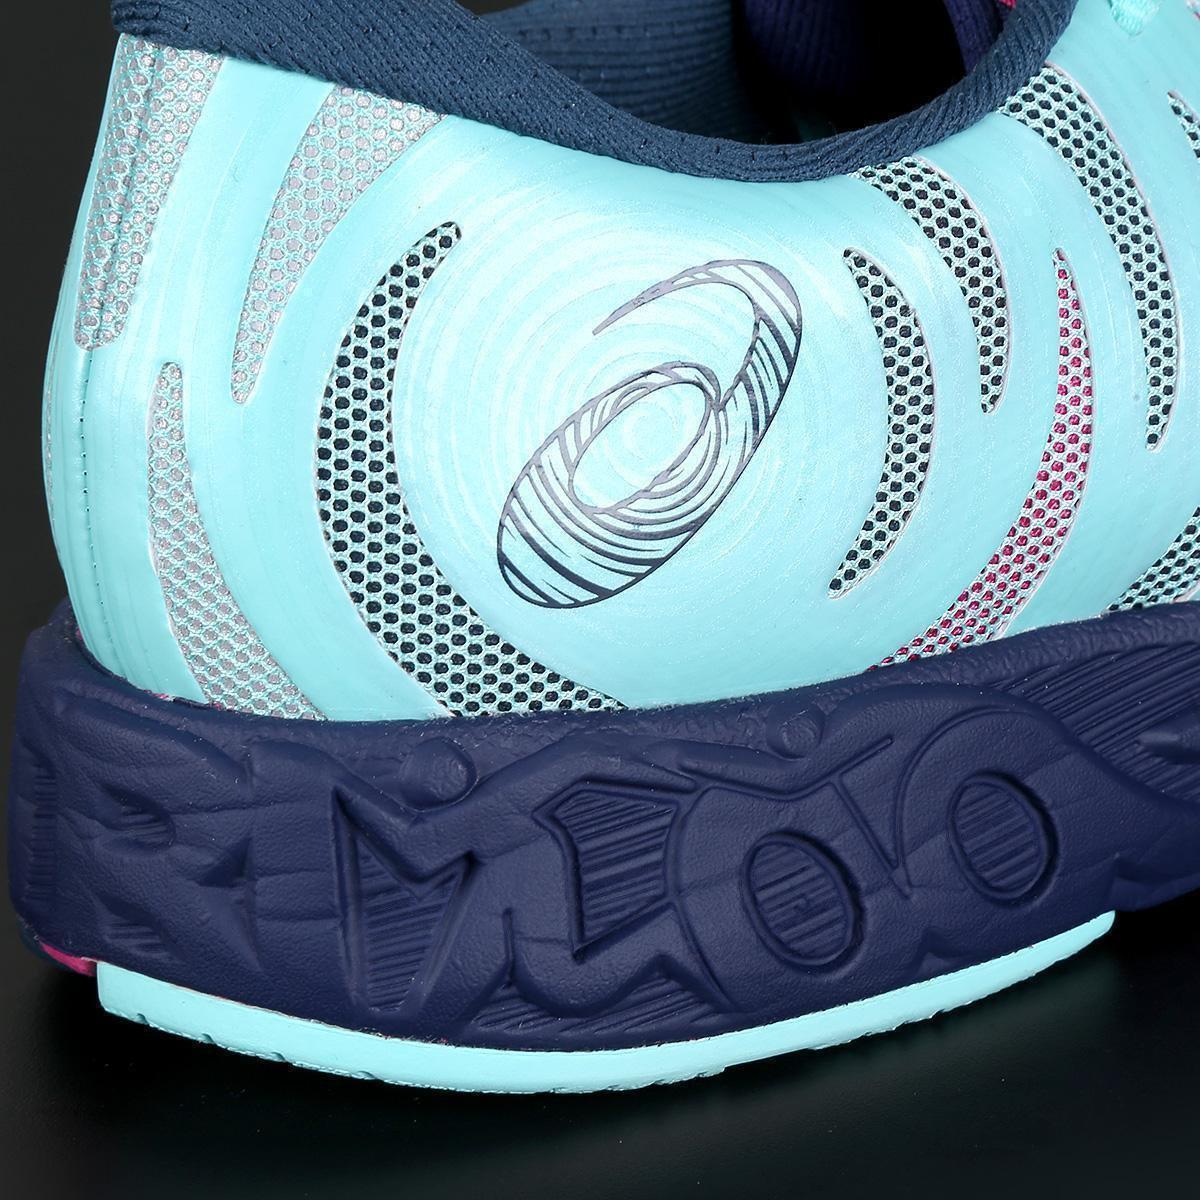 2 Asics Roxo e Tênis FF Noosa Azul Asics Noosa Tênis Feminino gxOqwp1T